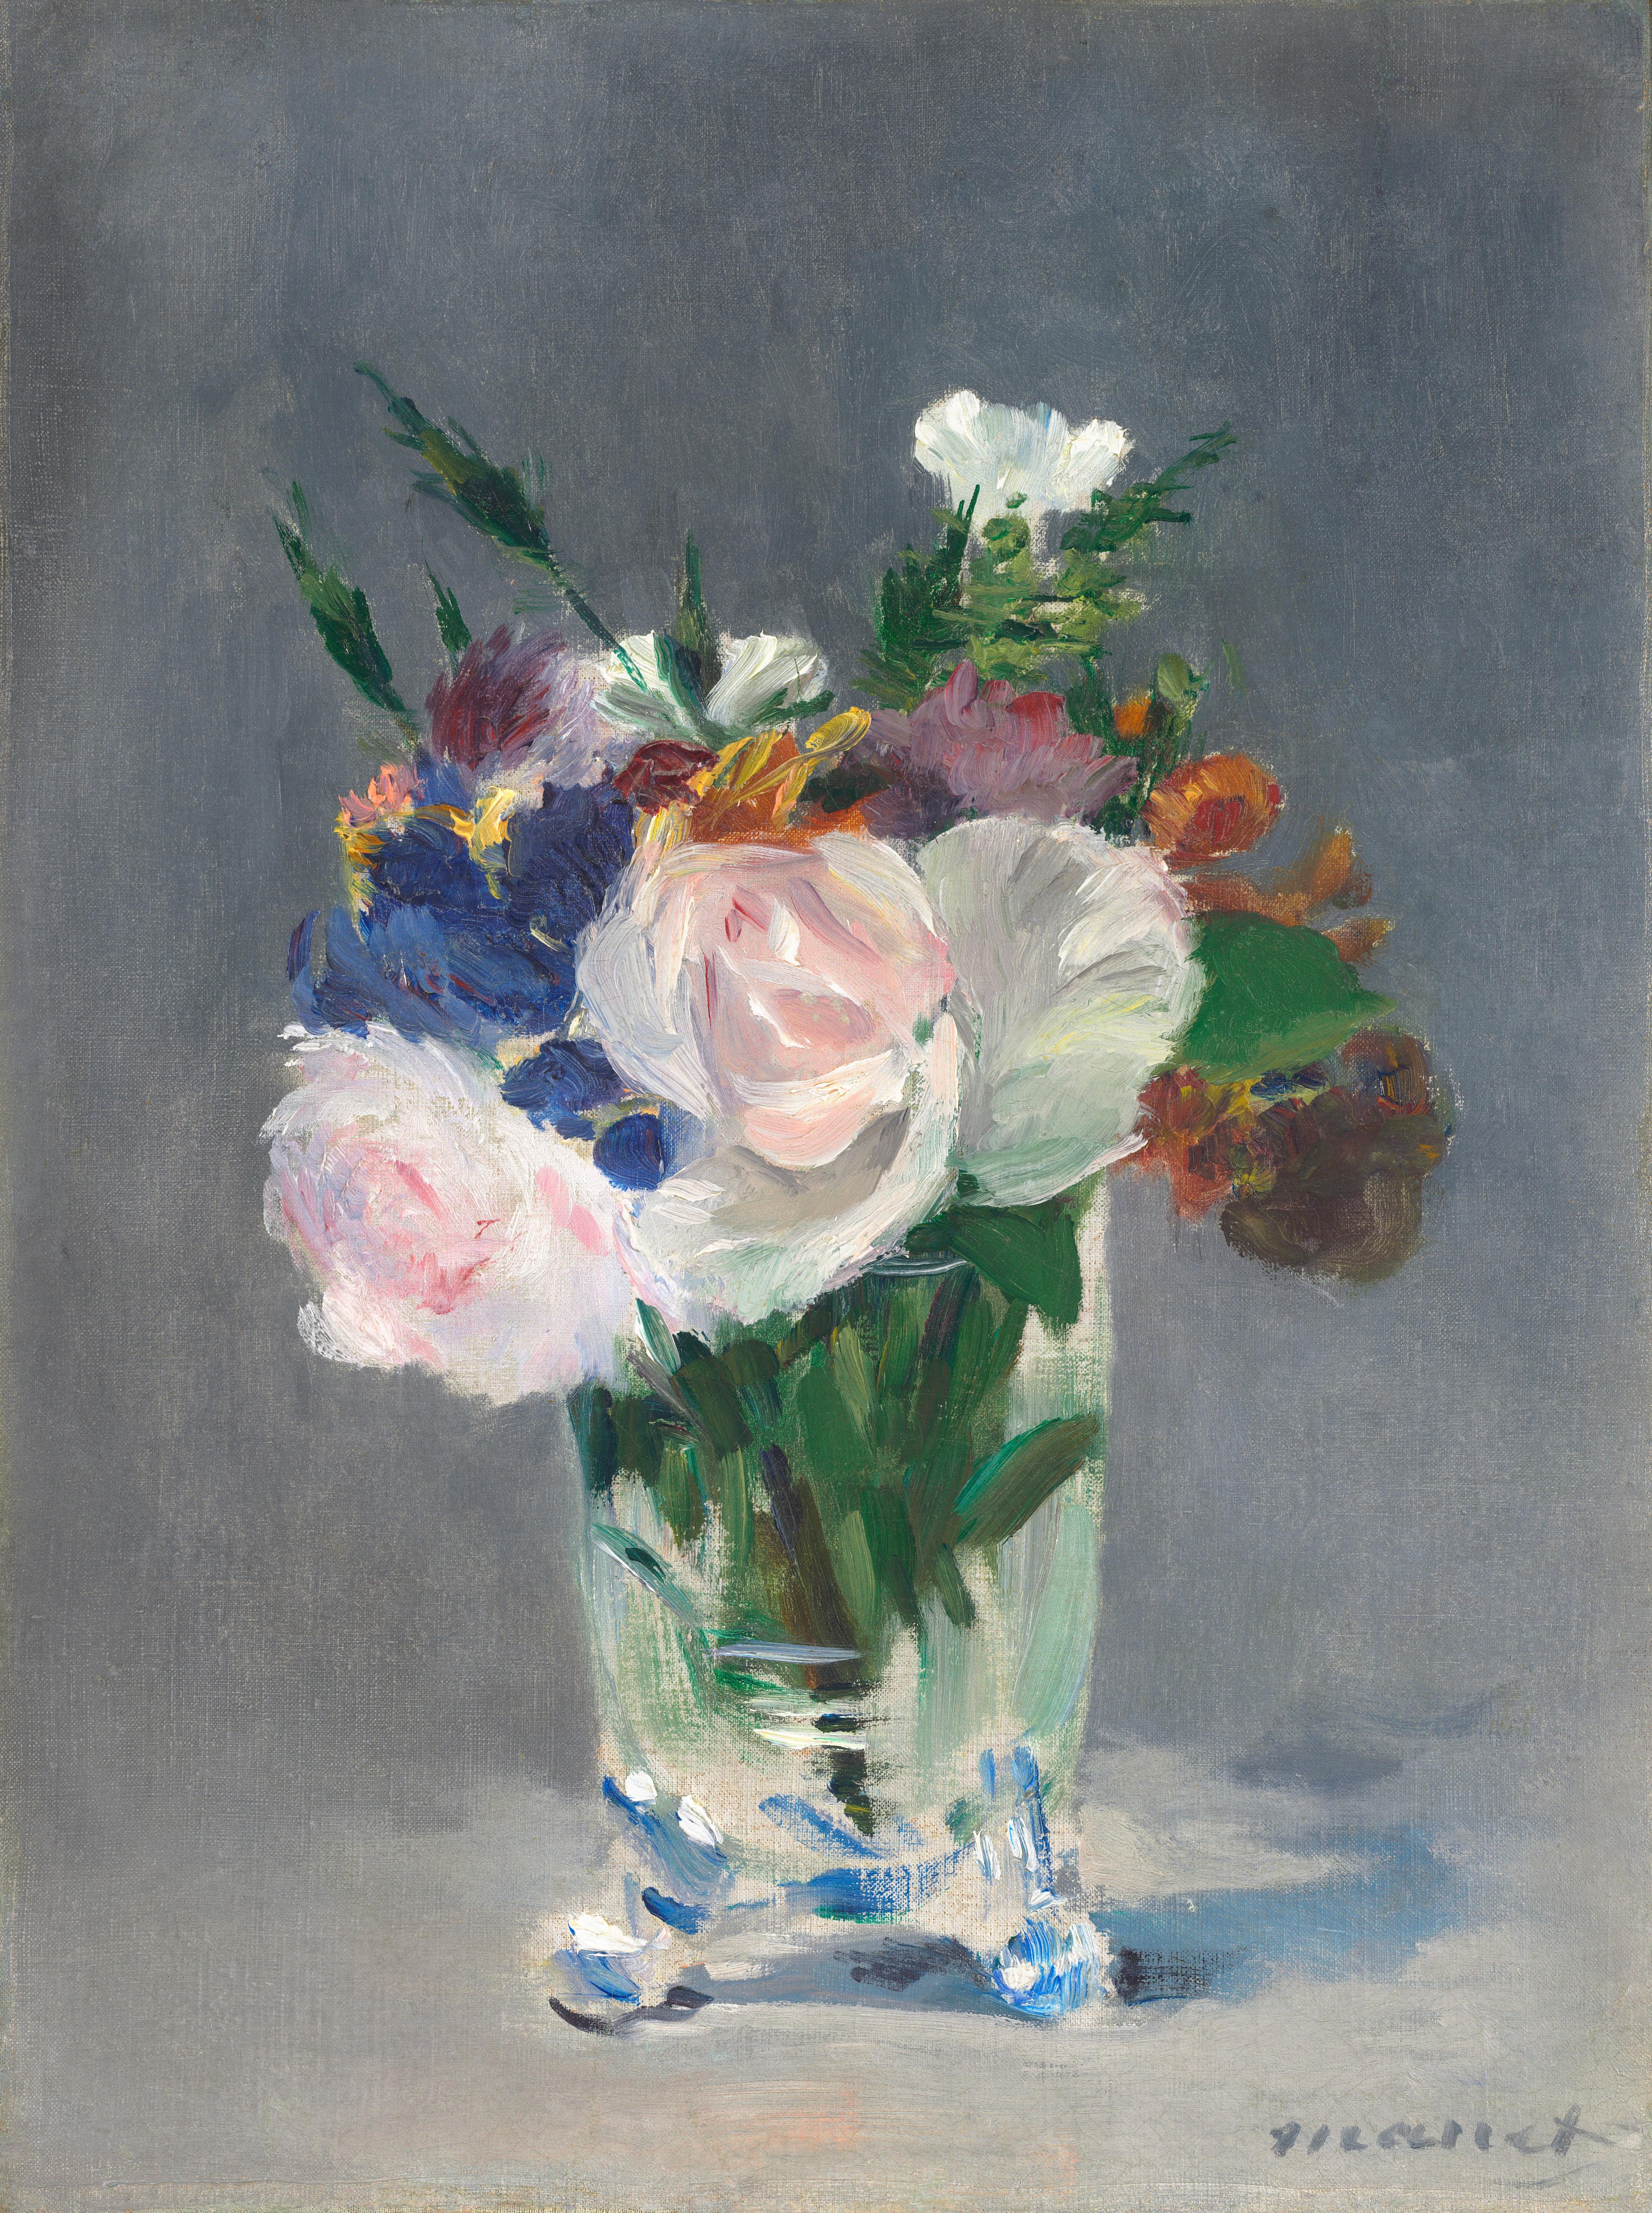 https://upload.wikimedia.org/wikipedia/commons/b/b6/Flowers_in_a_Crystal_Vase%2C_Edouard_Manet%2C_c1882.jpg